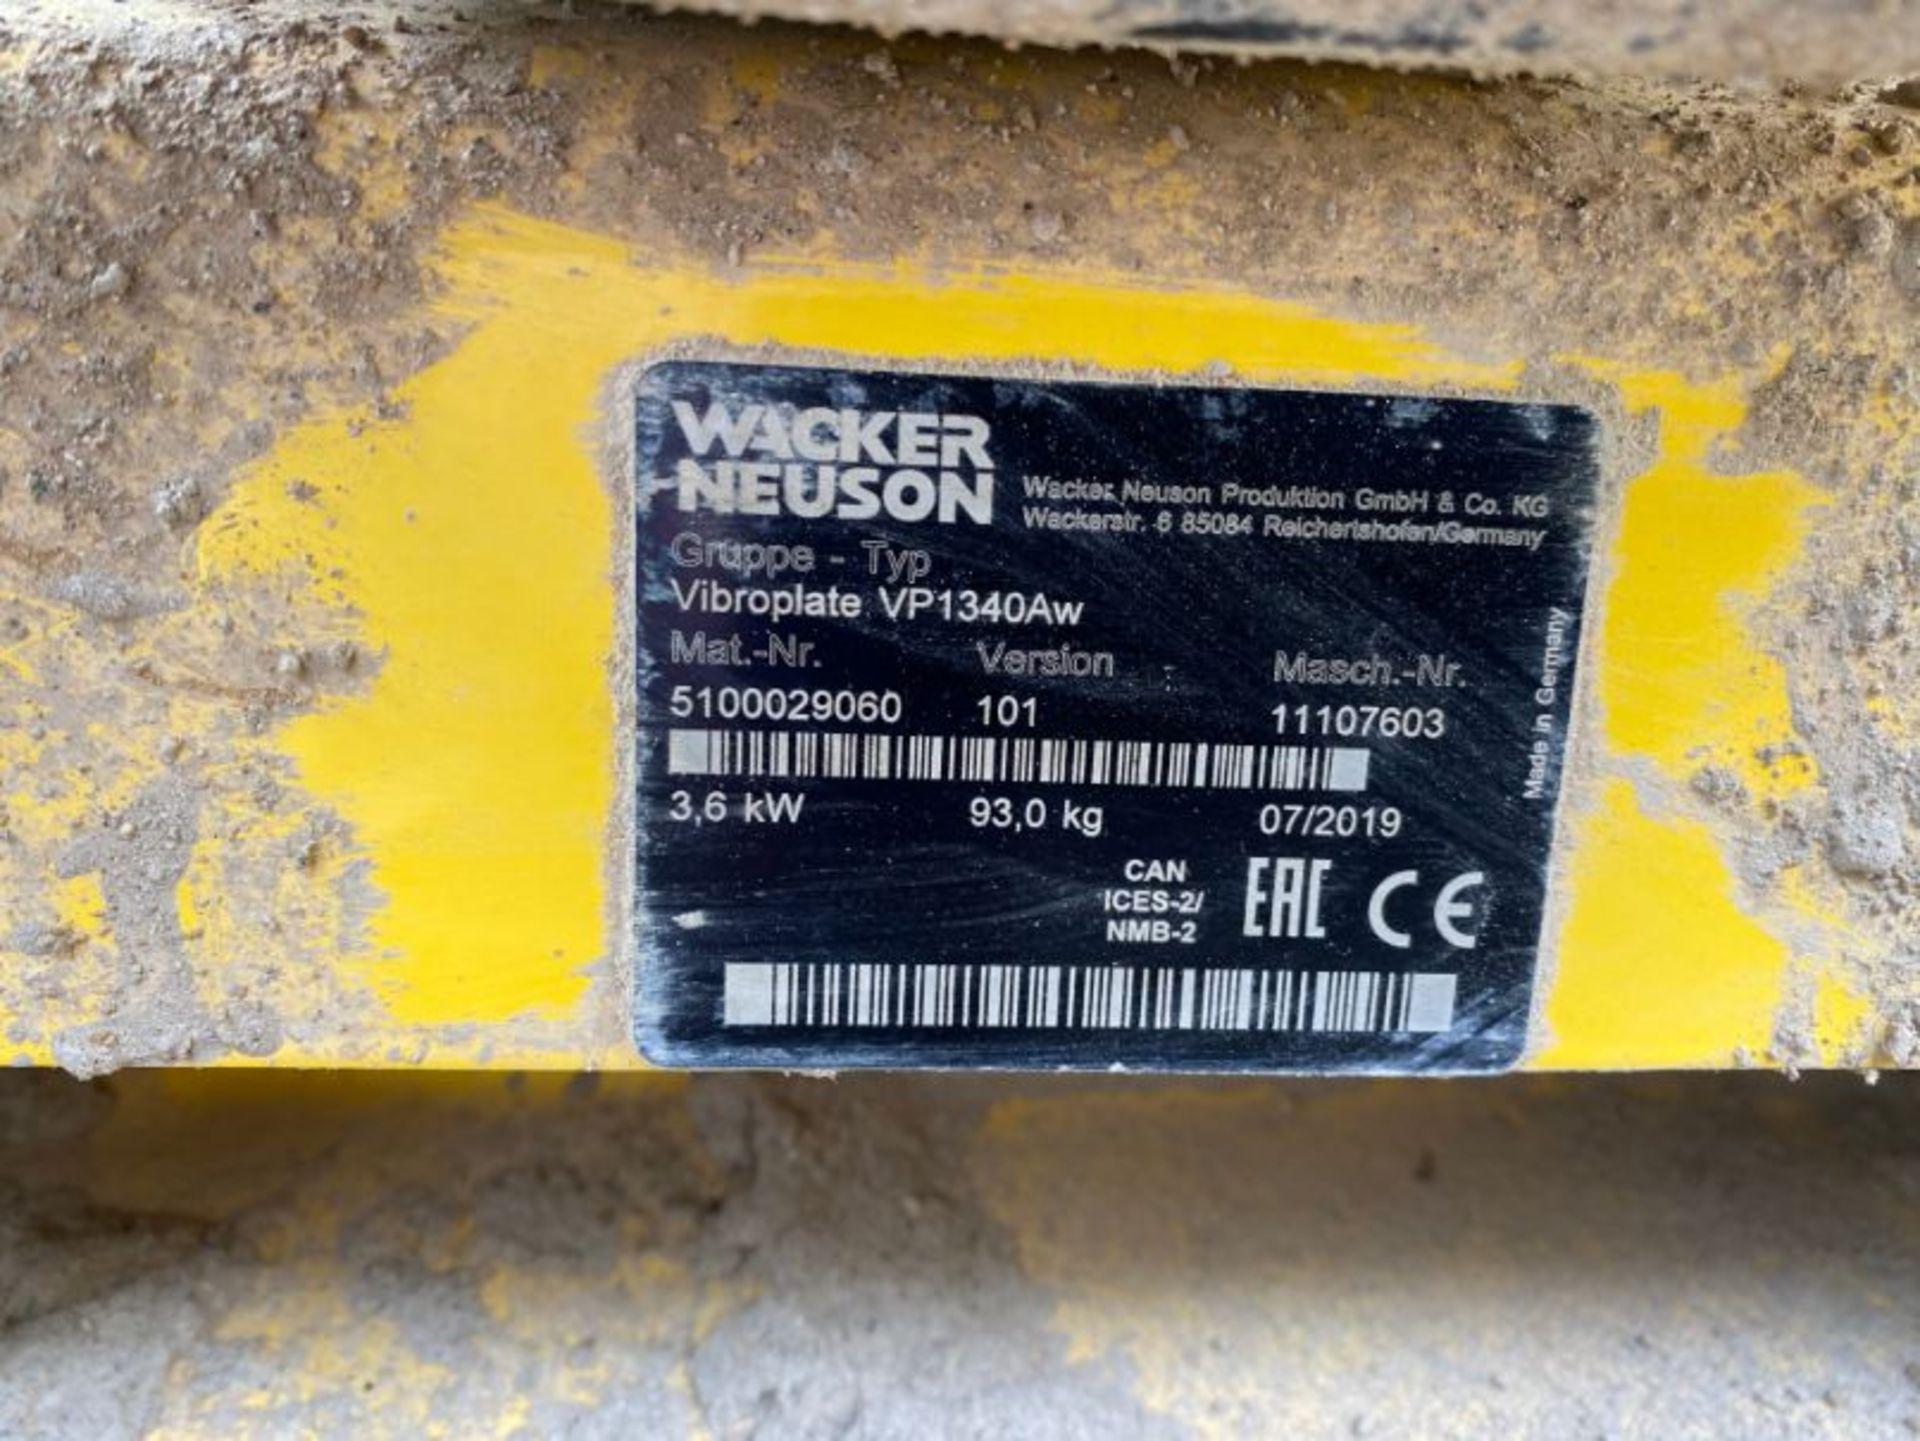 Lot 71 - Wacker Neuson Vibroplate VP1340AW vibrating plate: serial no: 11107603 (2019): (delivered Feb-20)